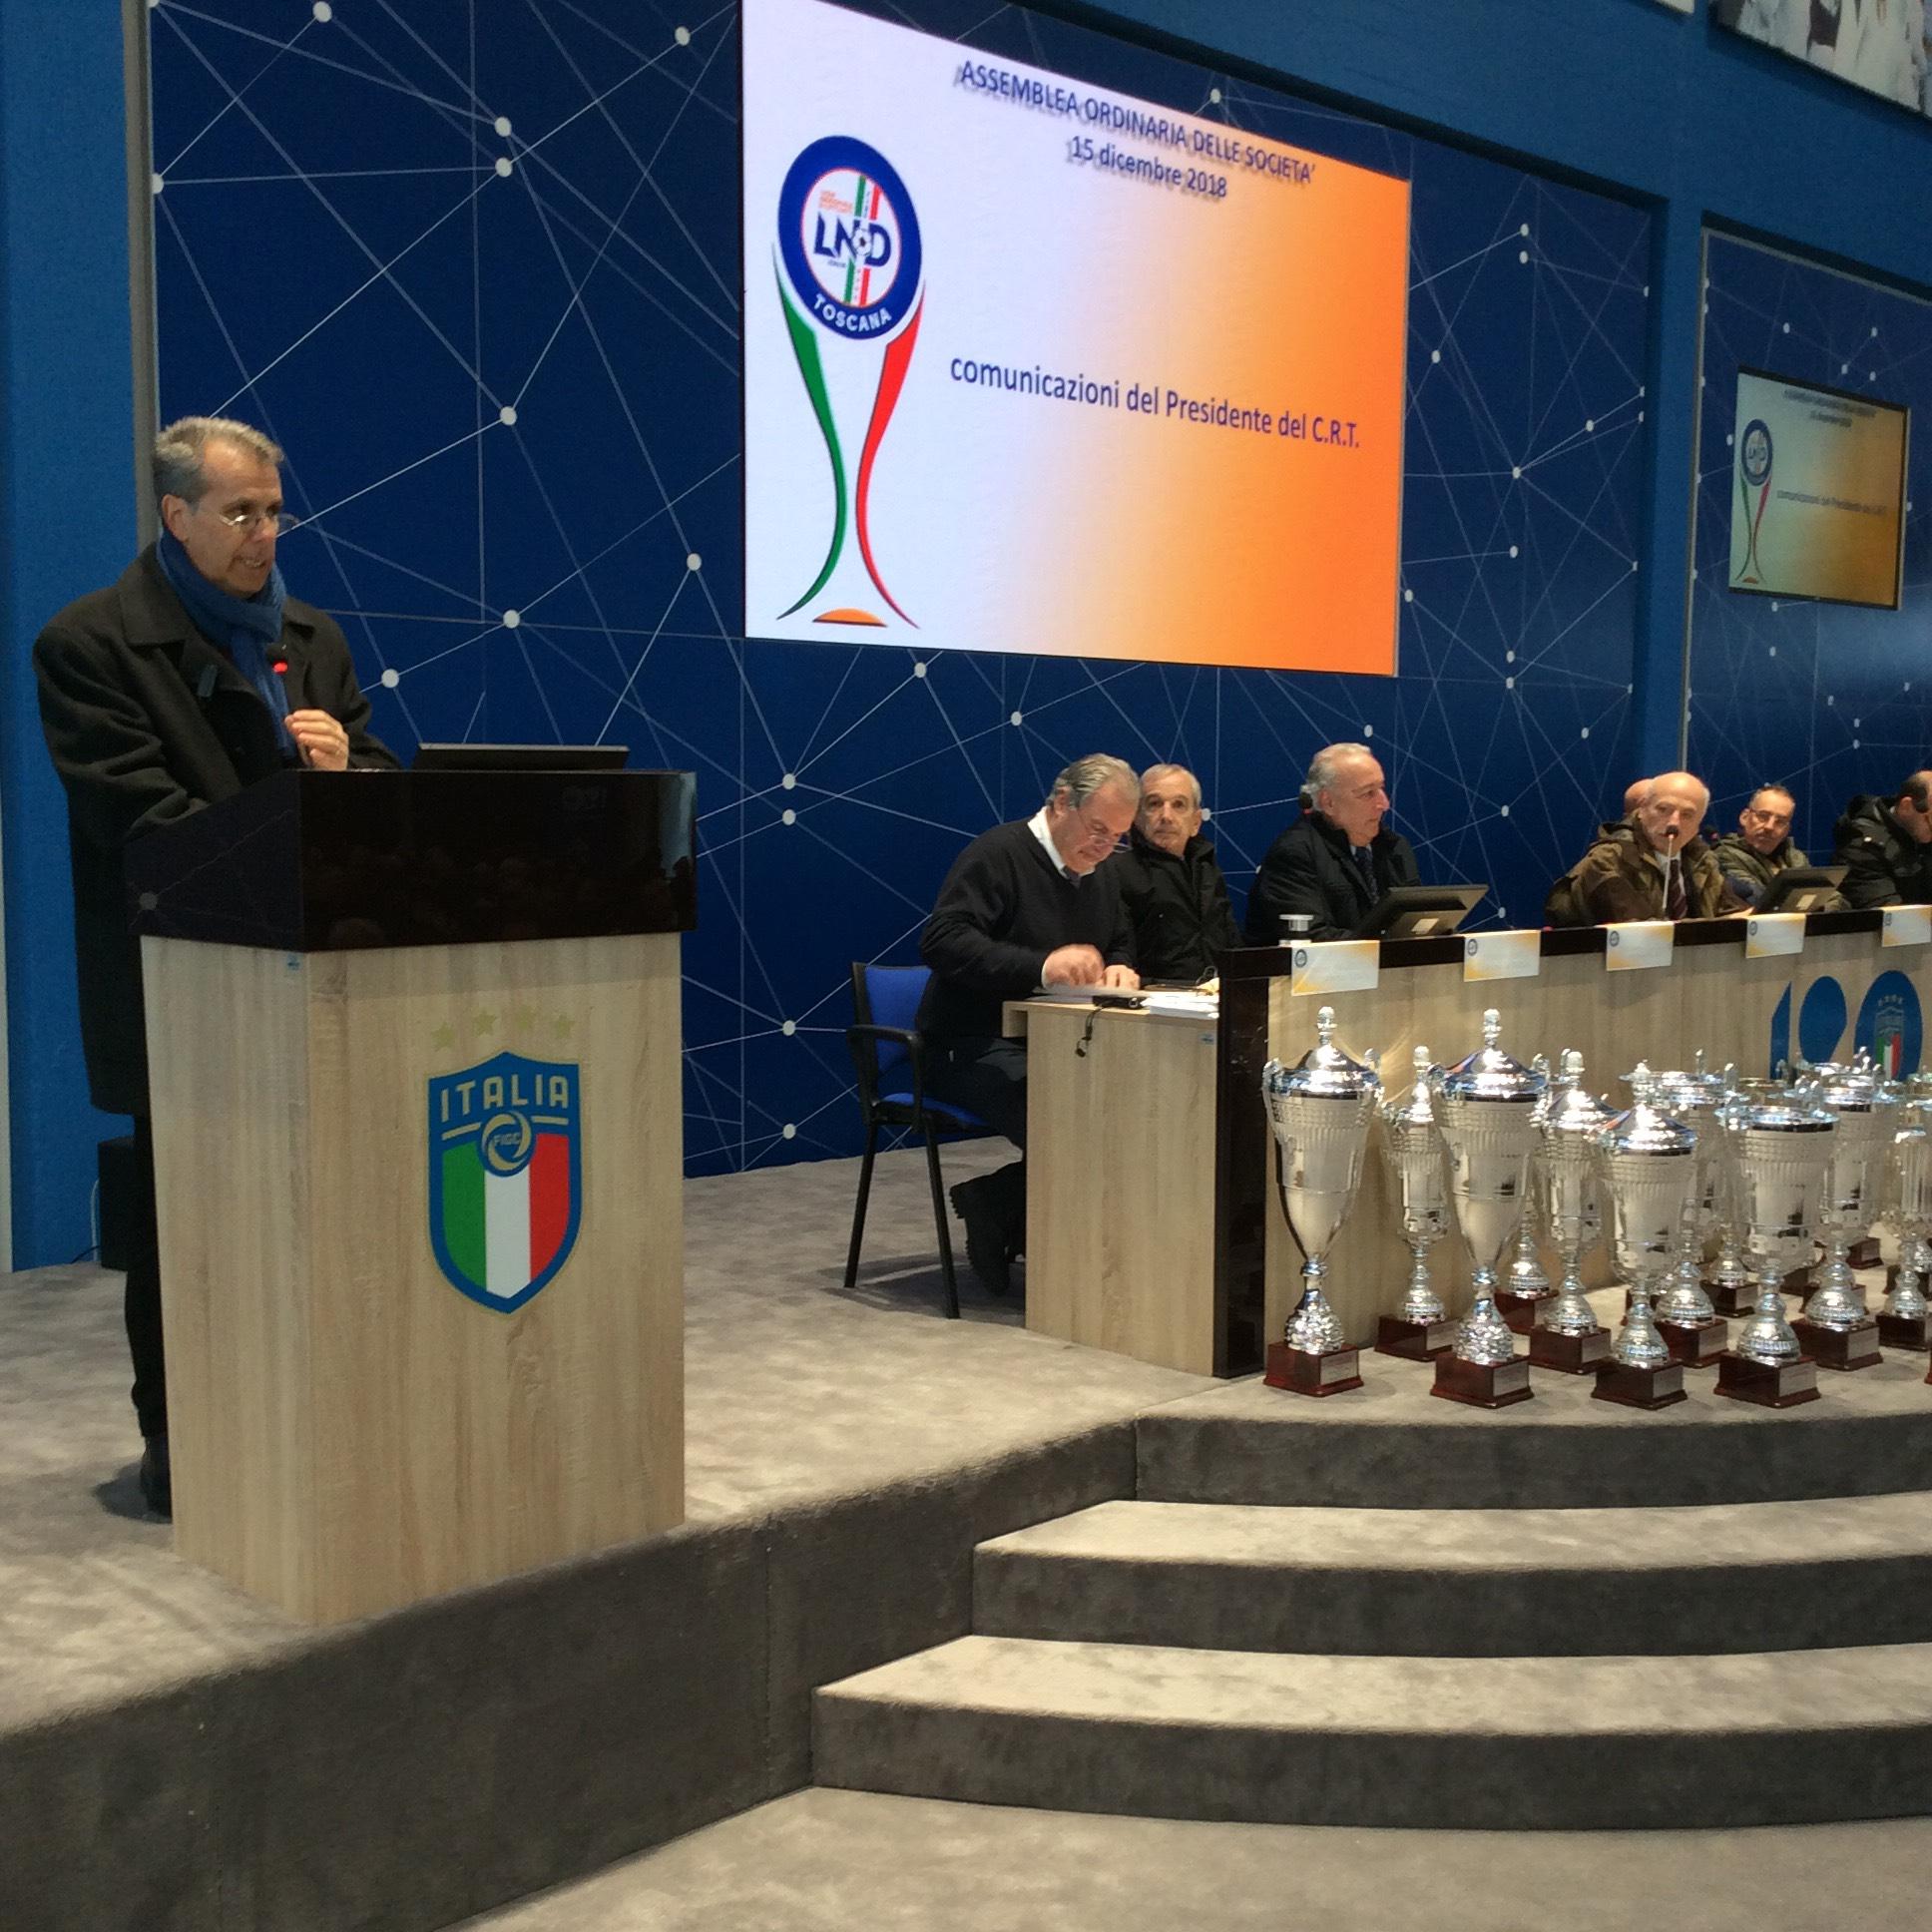 Paolo Mangini Comitato Regionale Toscana